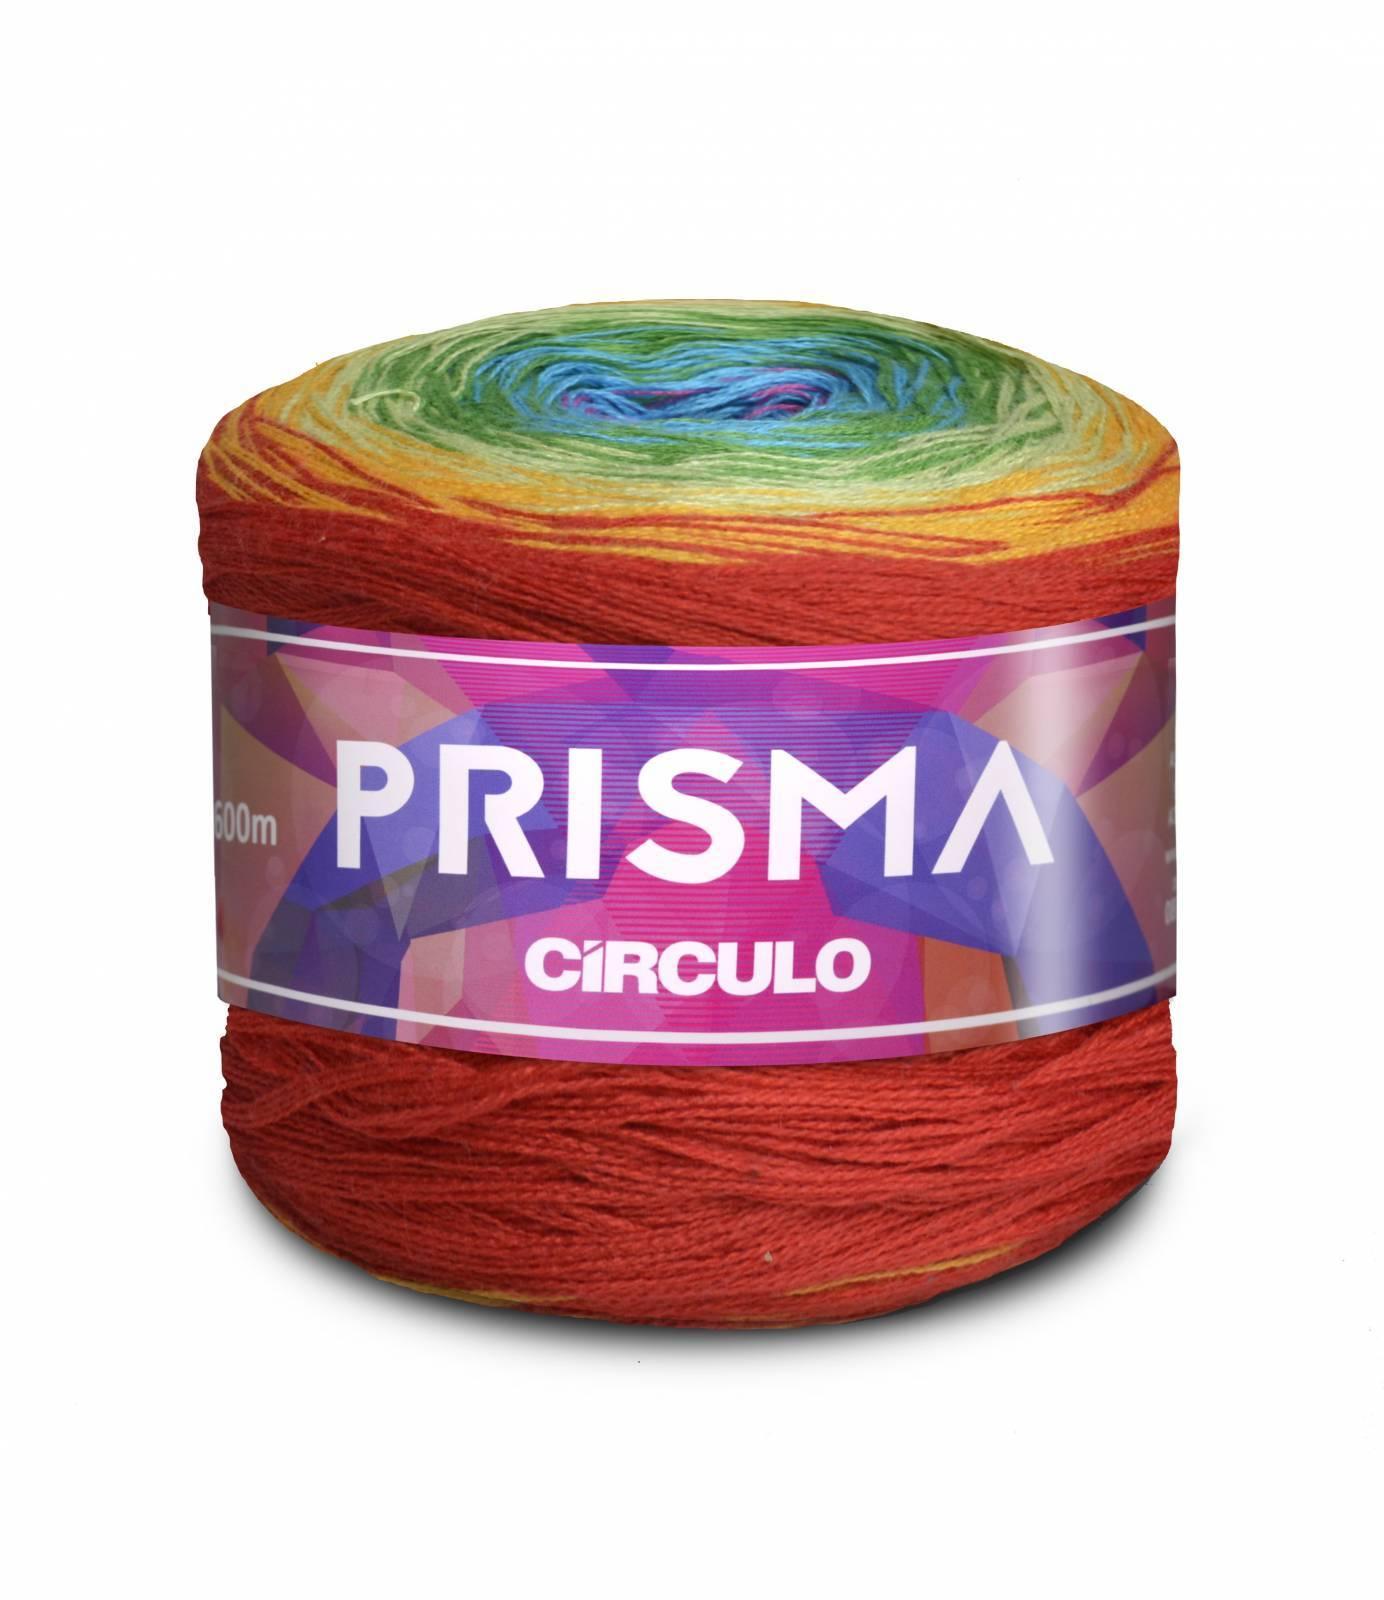 Prisma 9849 Arco Íris - BAÚ DA VOVÓ